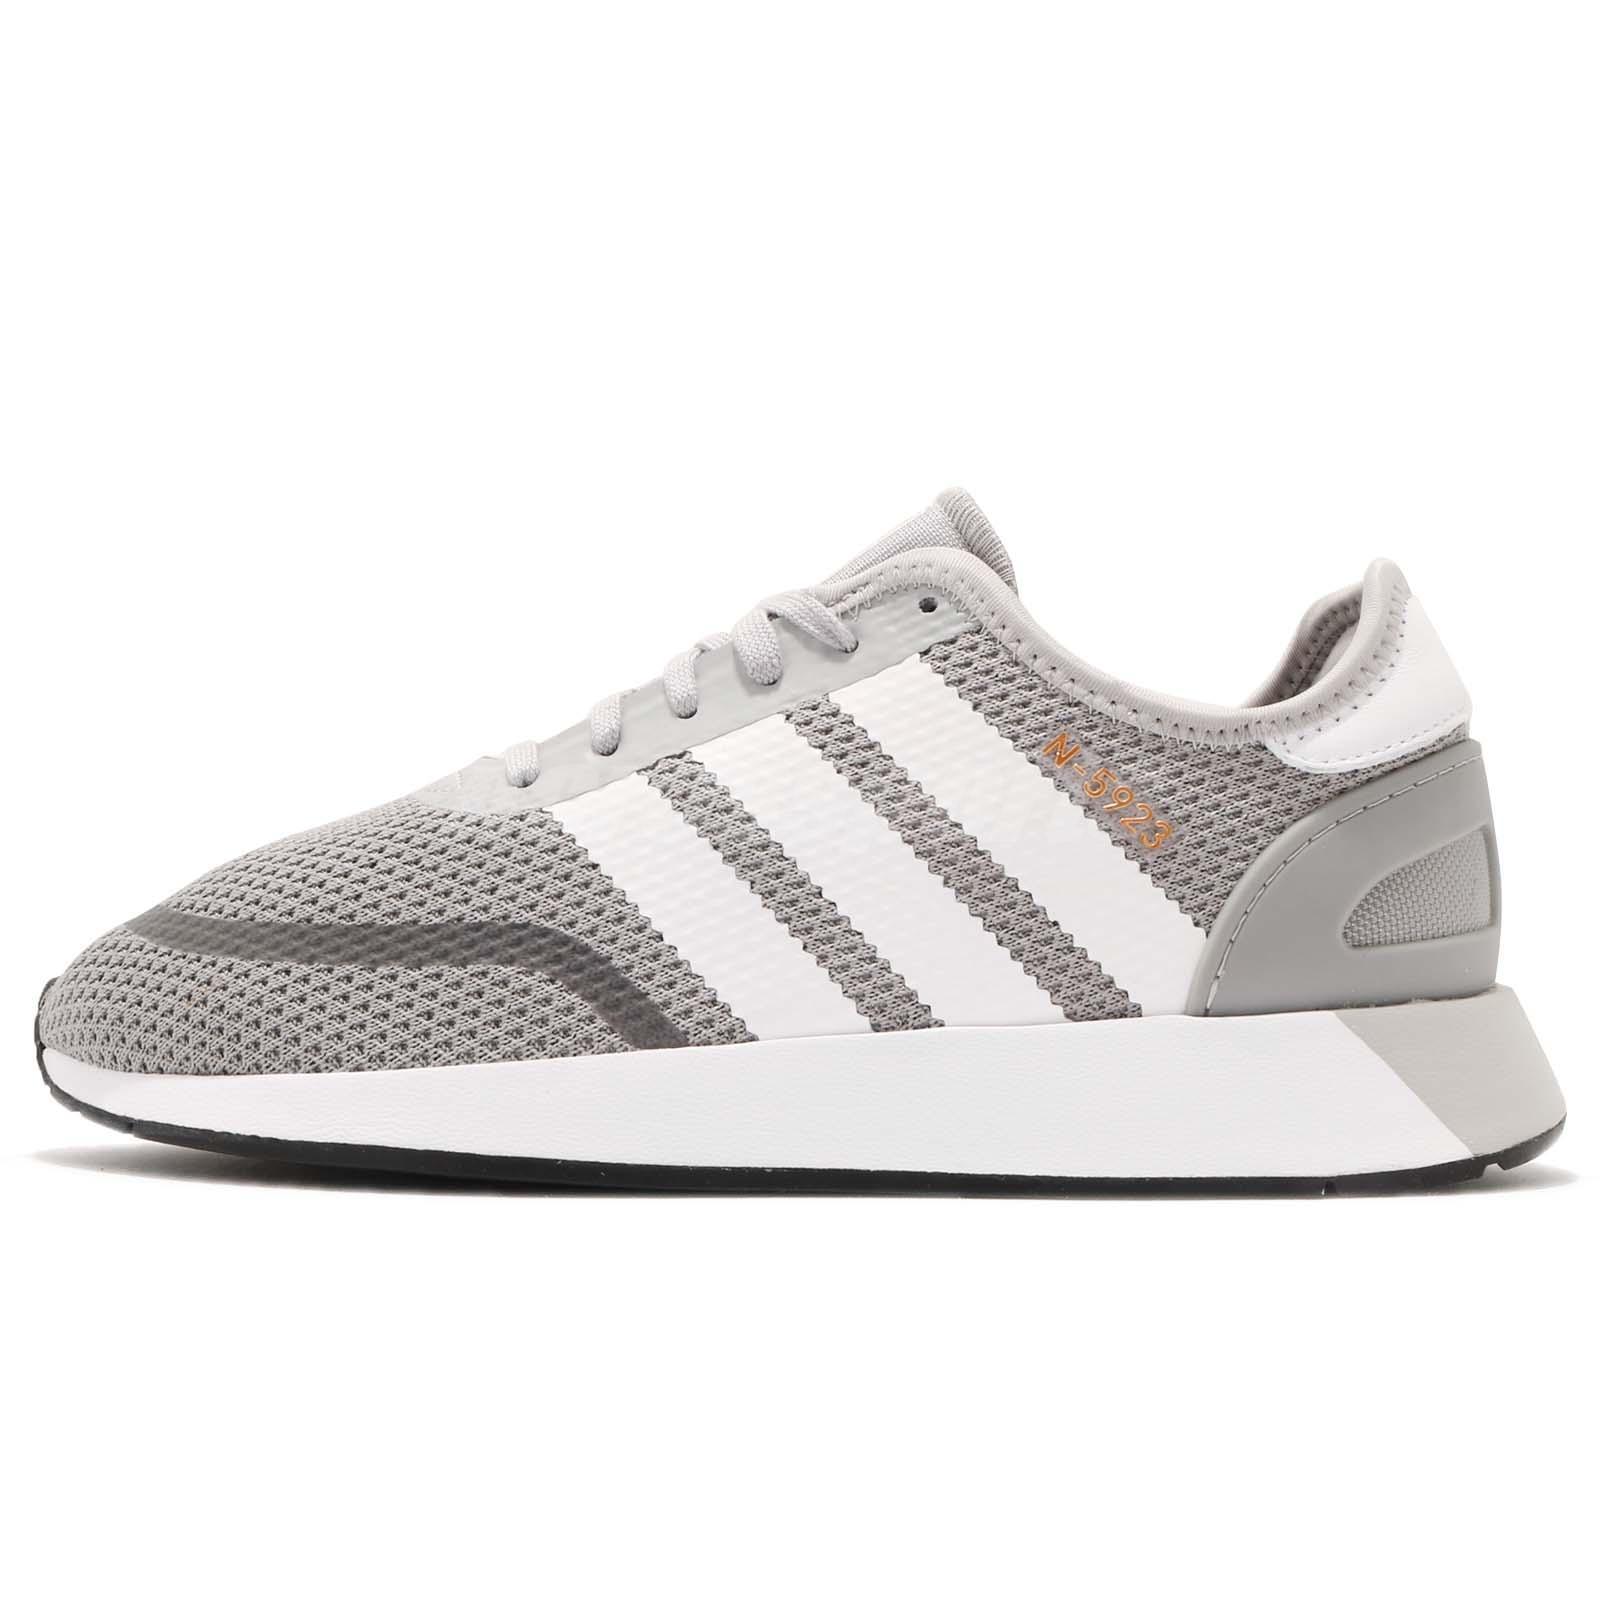 Details about adidas Originals N-5923 Iniki Runner Grey White Men Running  Shoes Sneaker CQ2334